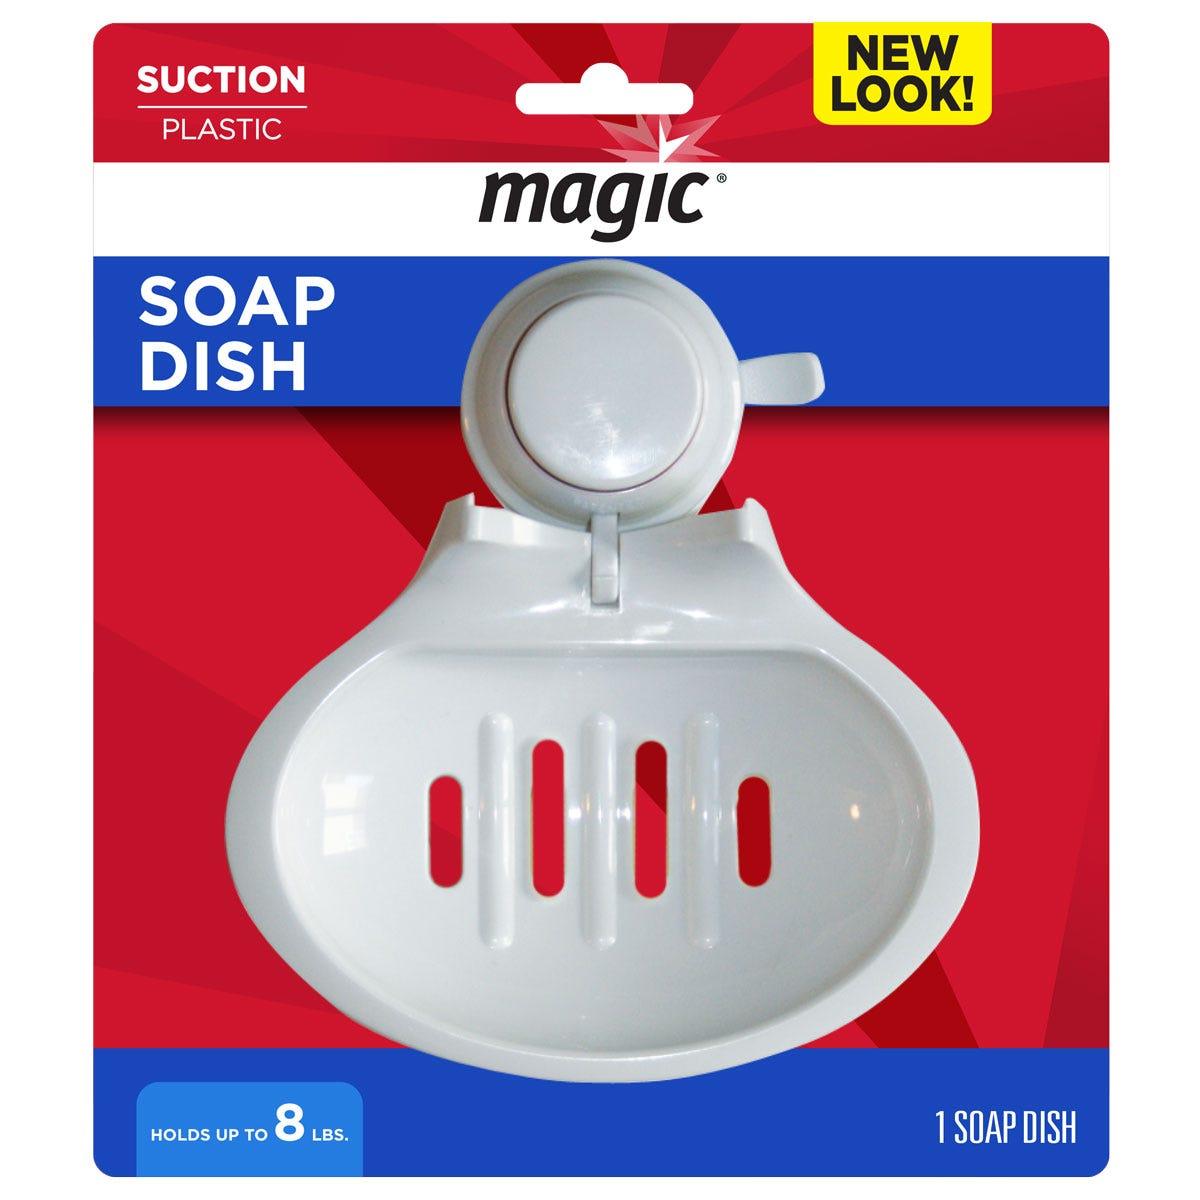 https://googone.com/media/catalog/product/m/a/magic-suction-soap-dish_front.jpg